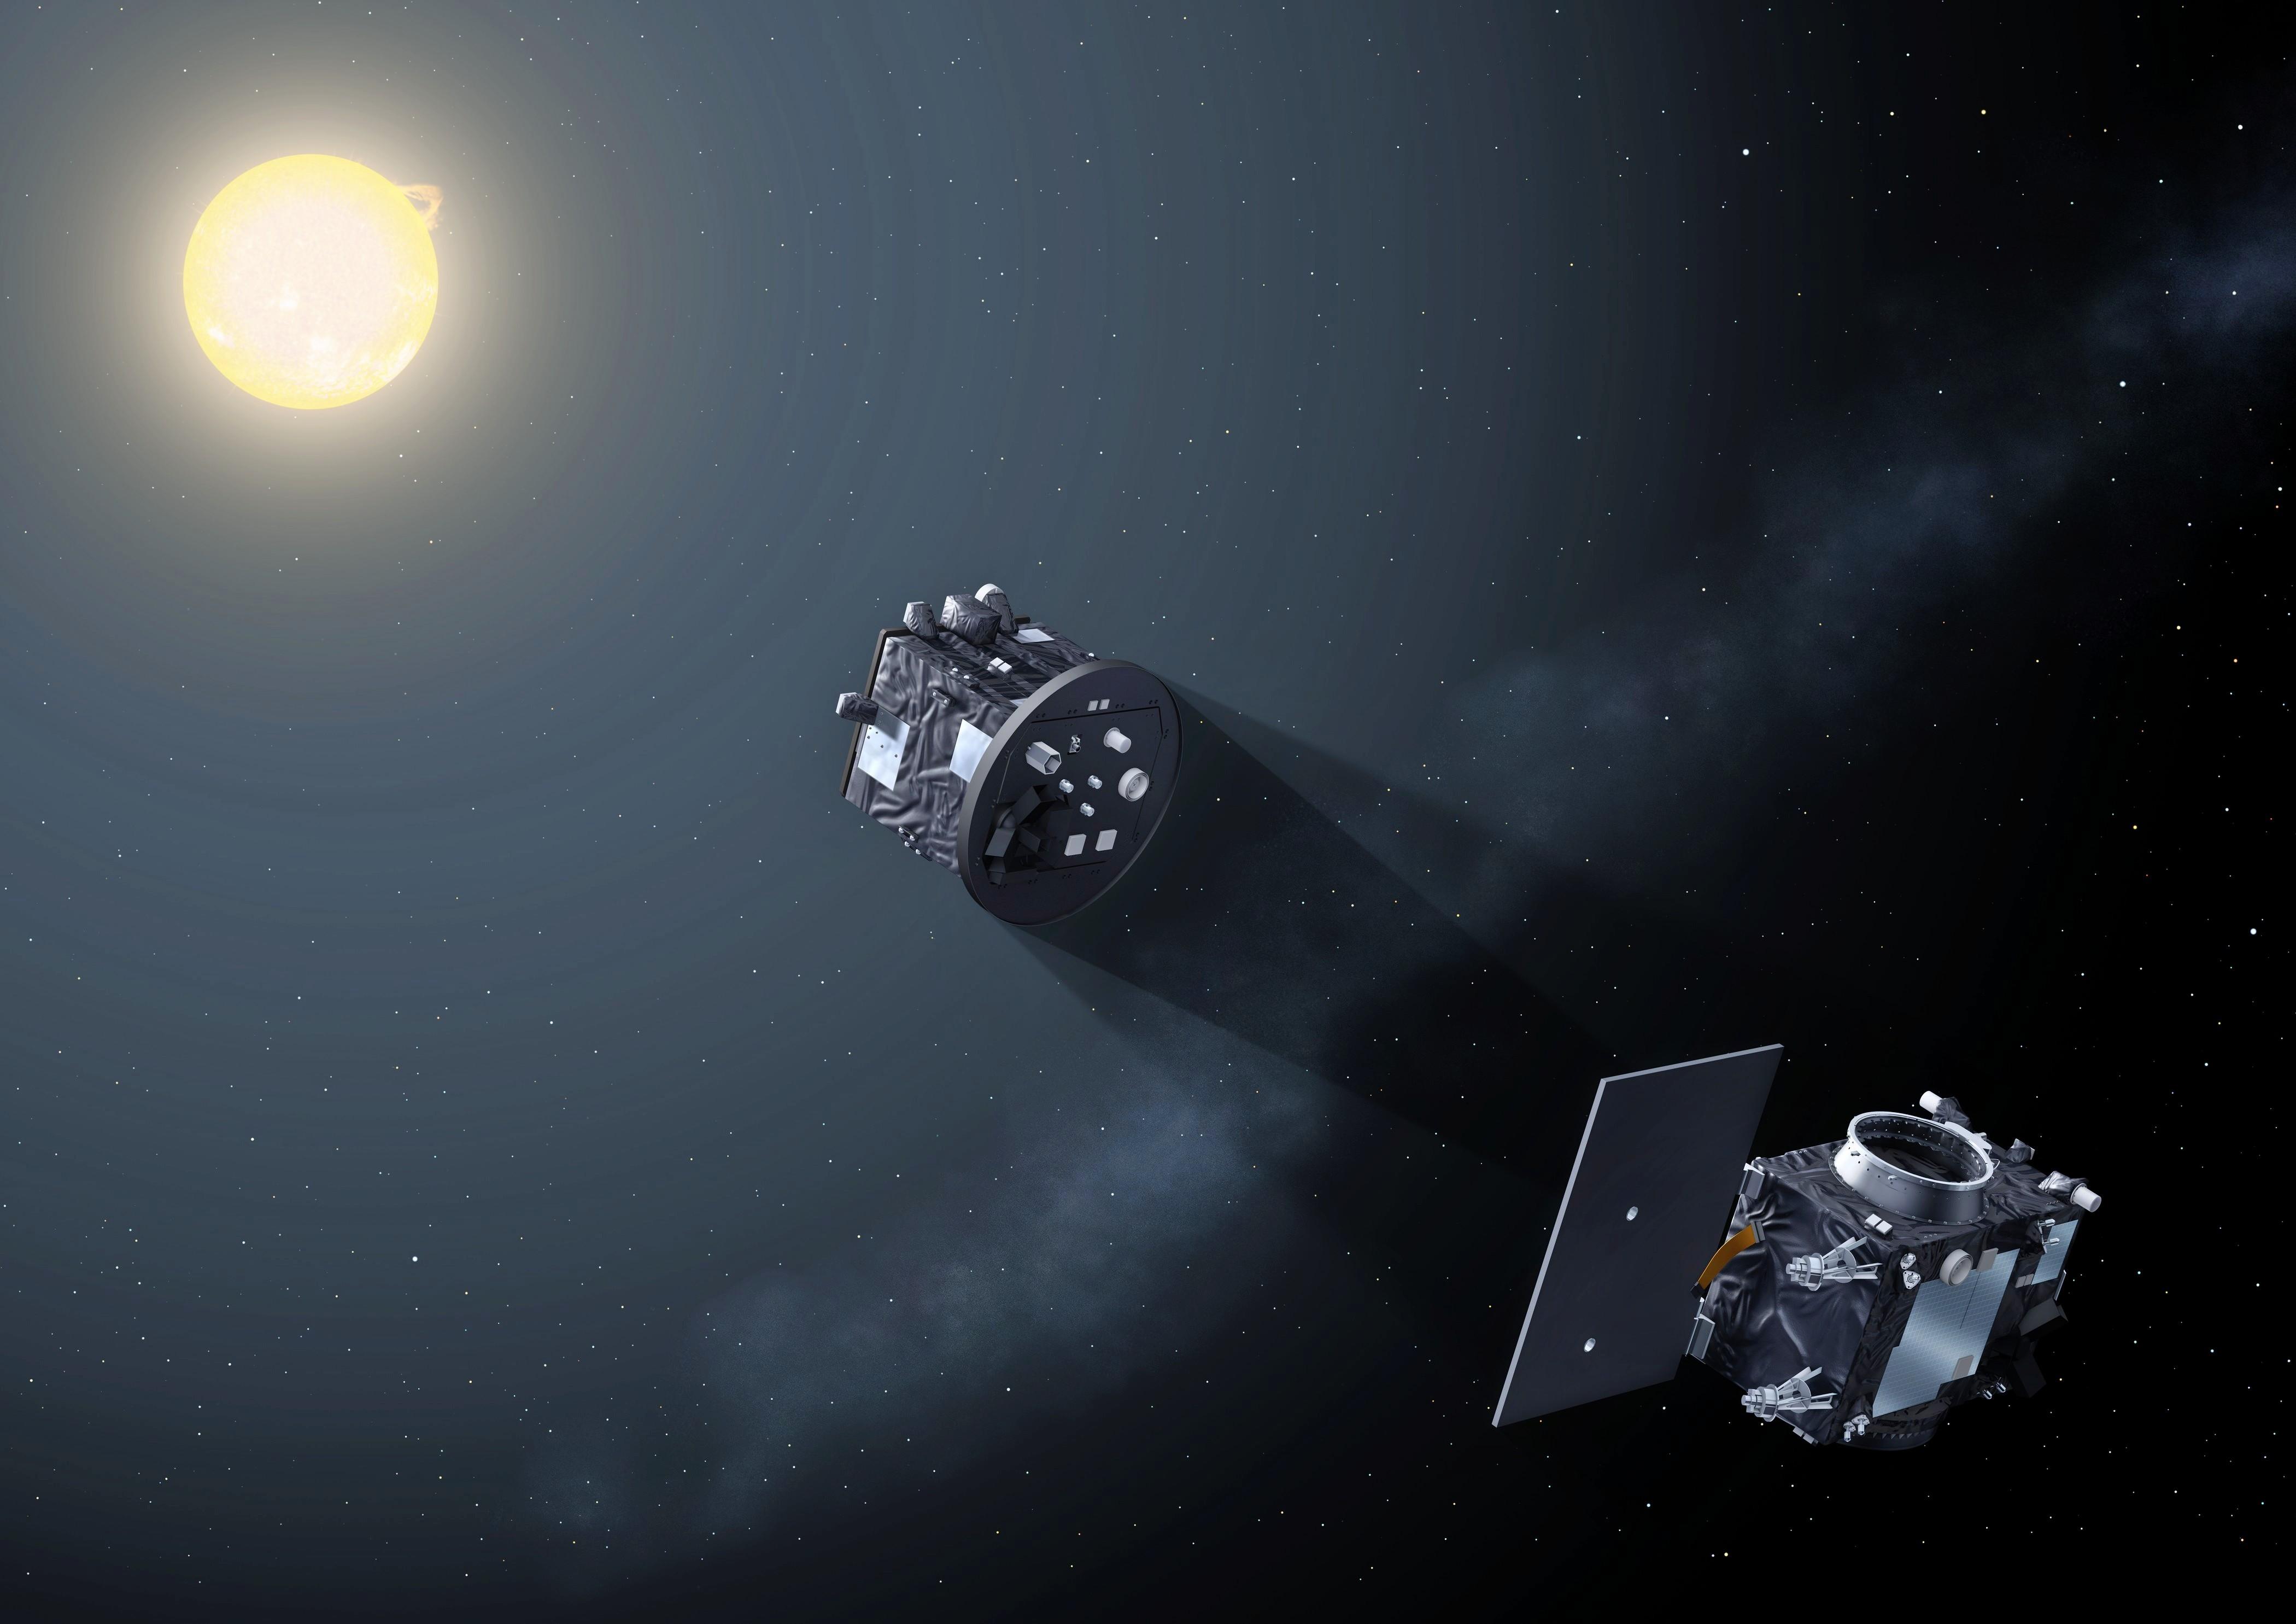 Proba-3 satellites form artificial eclipse. Image via ESA.